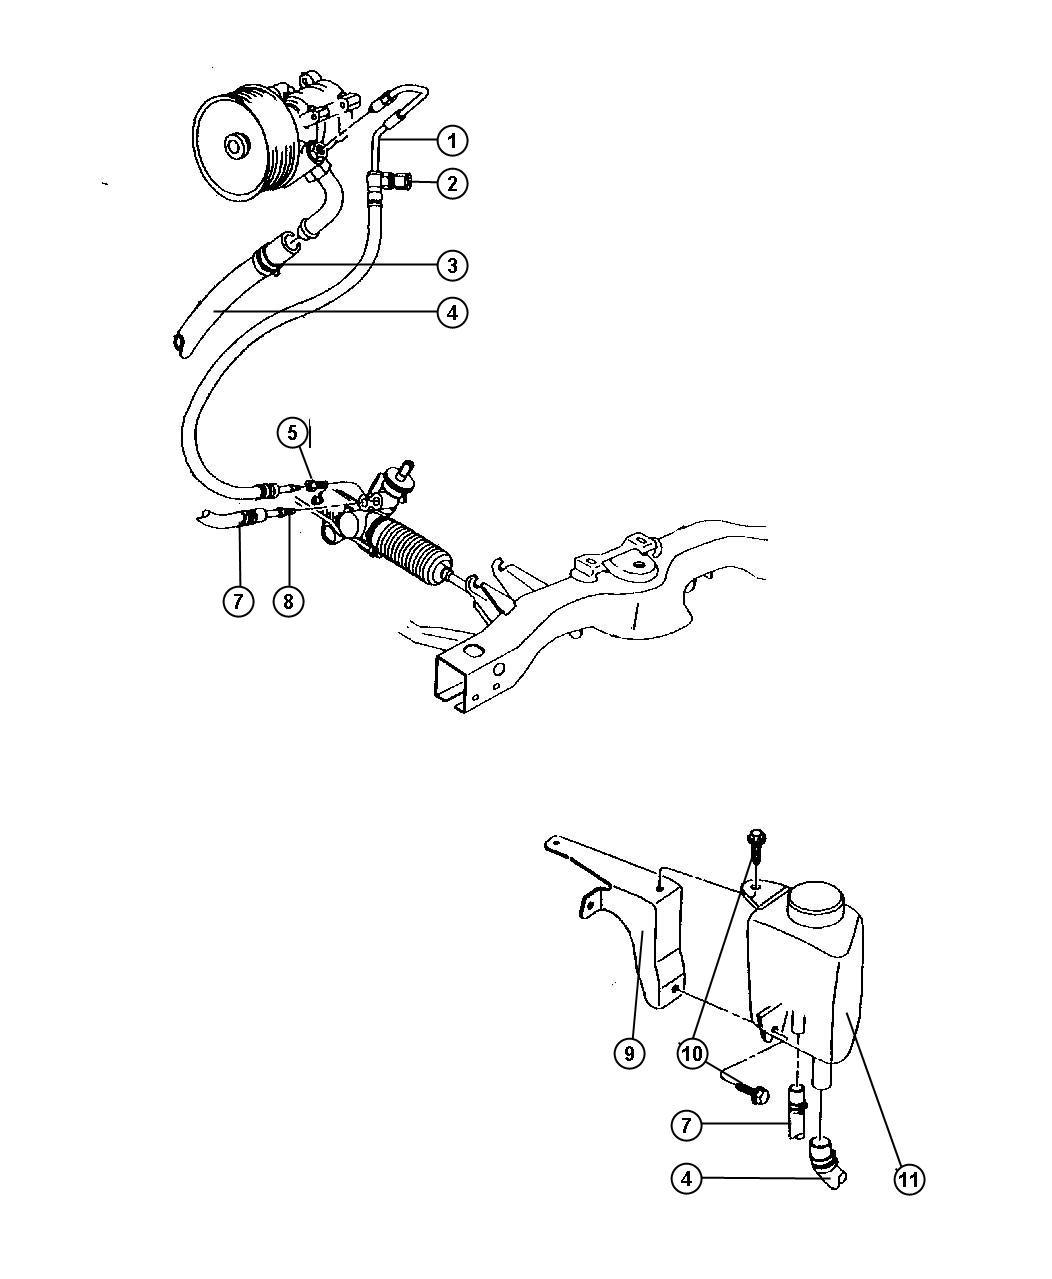 Dodge Dakota Fitting Power Steering Quick Connect